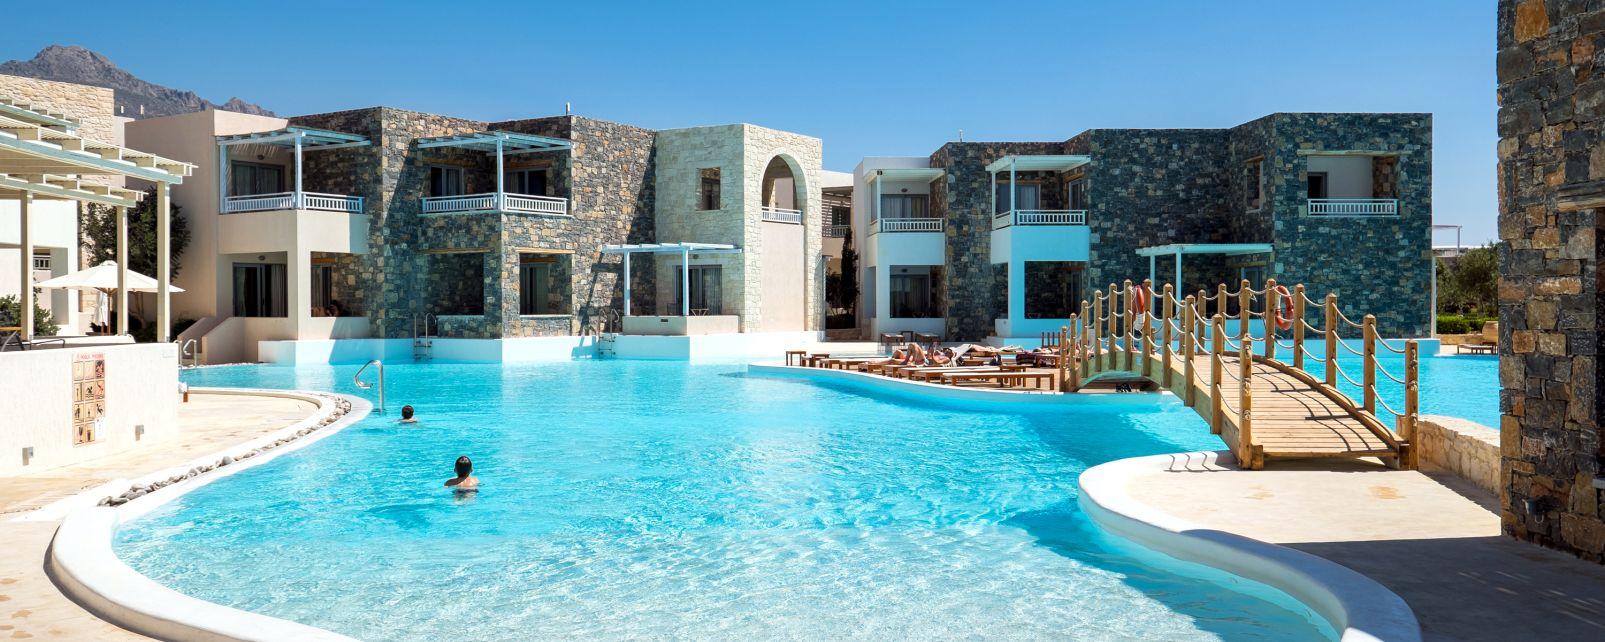 H tel club jet tours ostria beach ier petra gr ce for Hotels tours